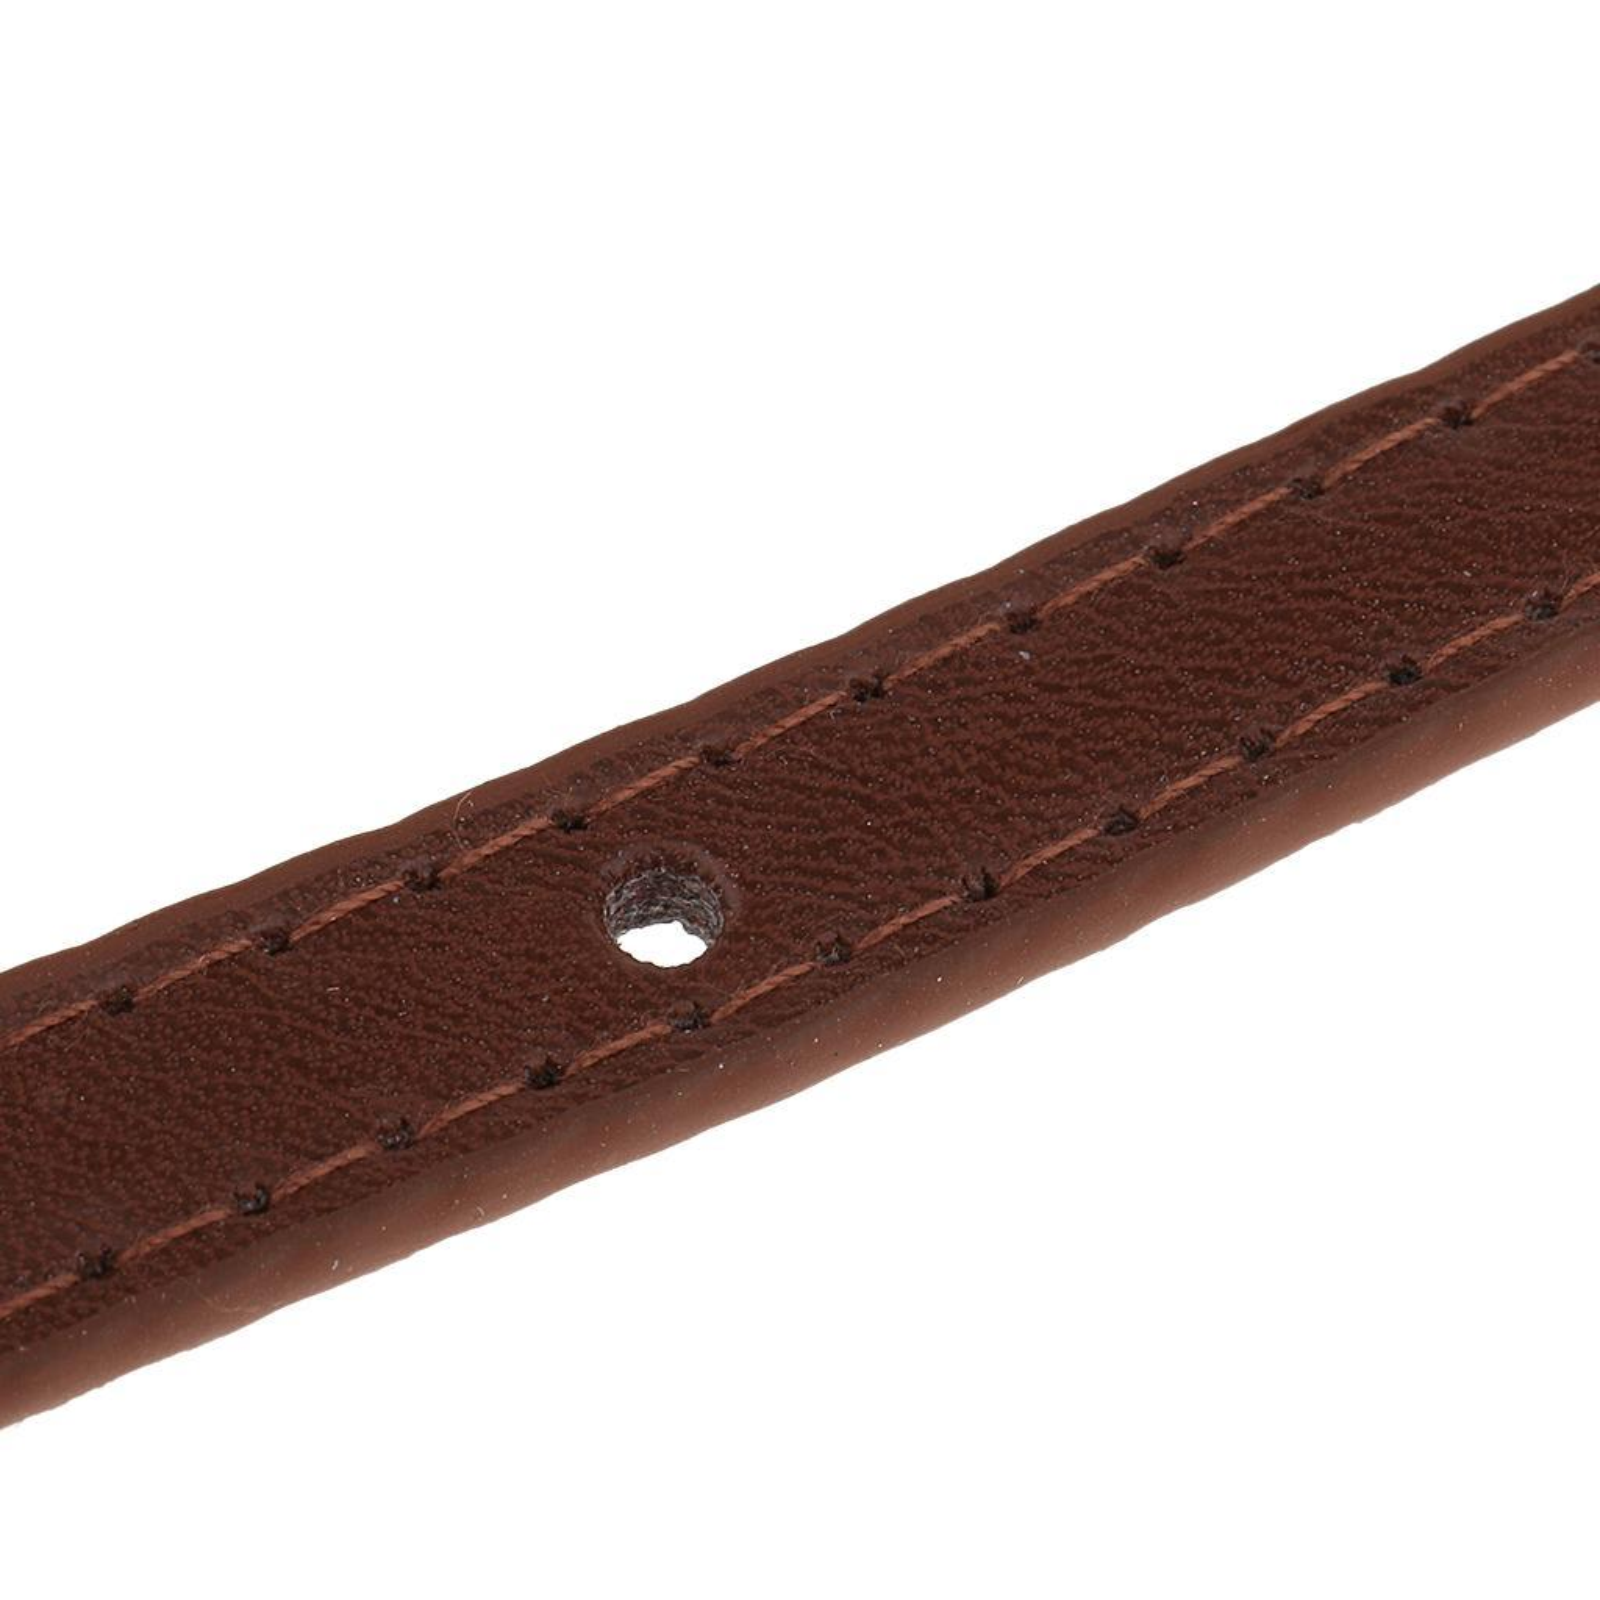 120cm-Bag-Leather-Strap-Replacement-Shoulder-Bags-Handle-Crossbody-Strap thumbnail 11